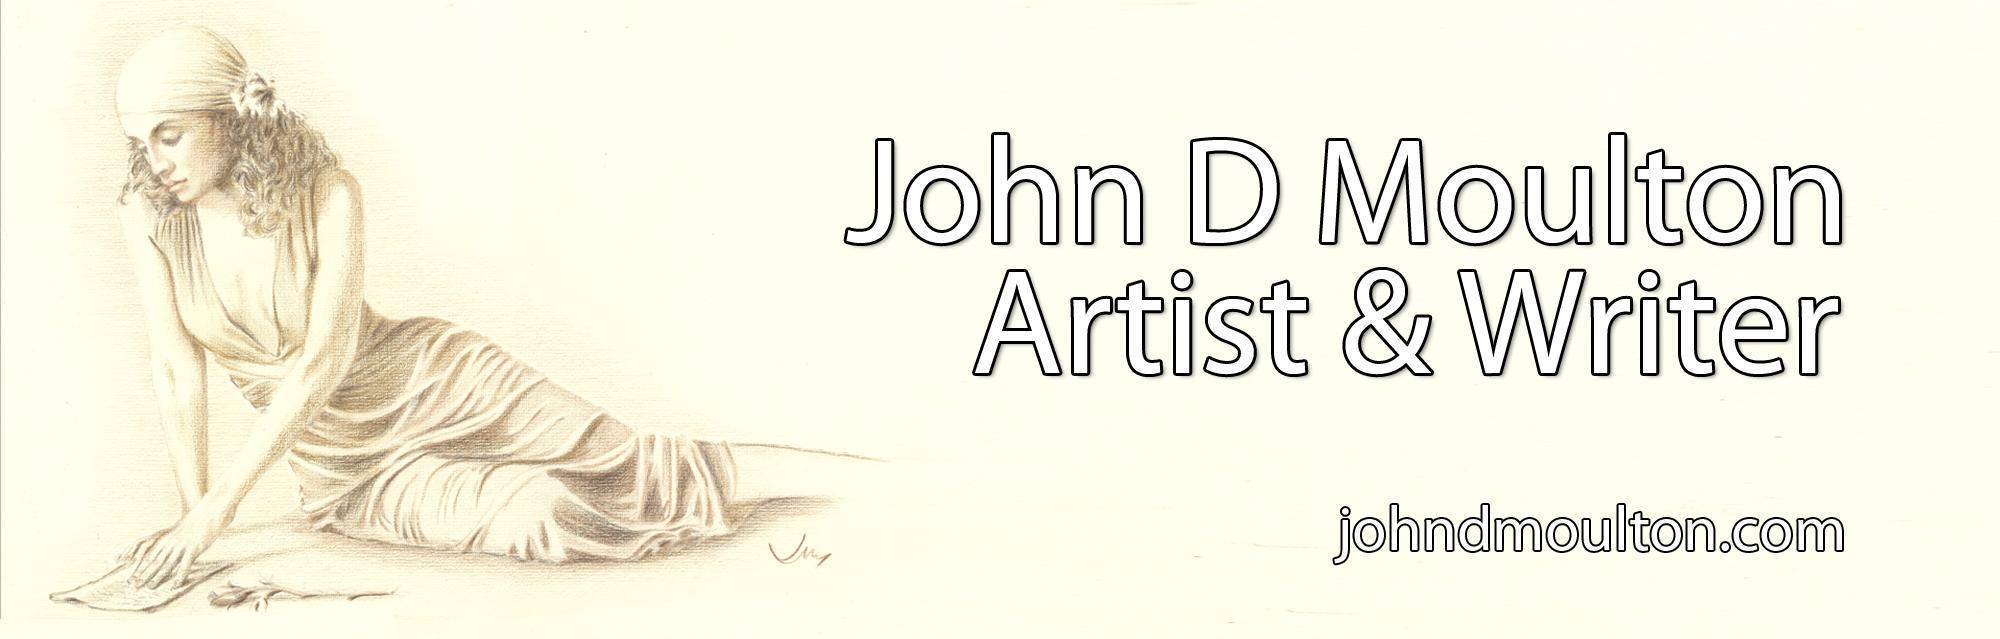 John D Moulton – Artist & Writer